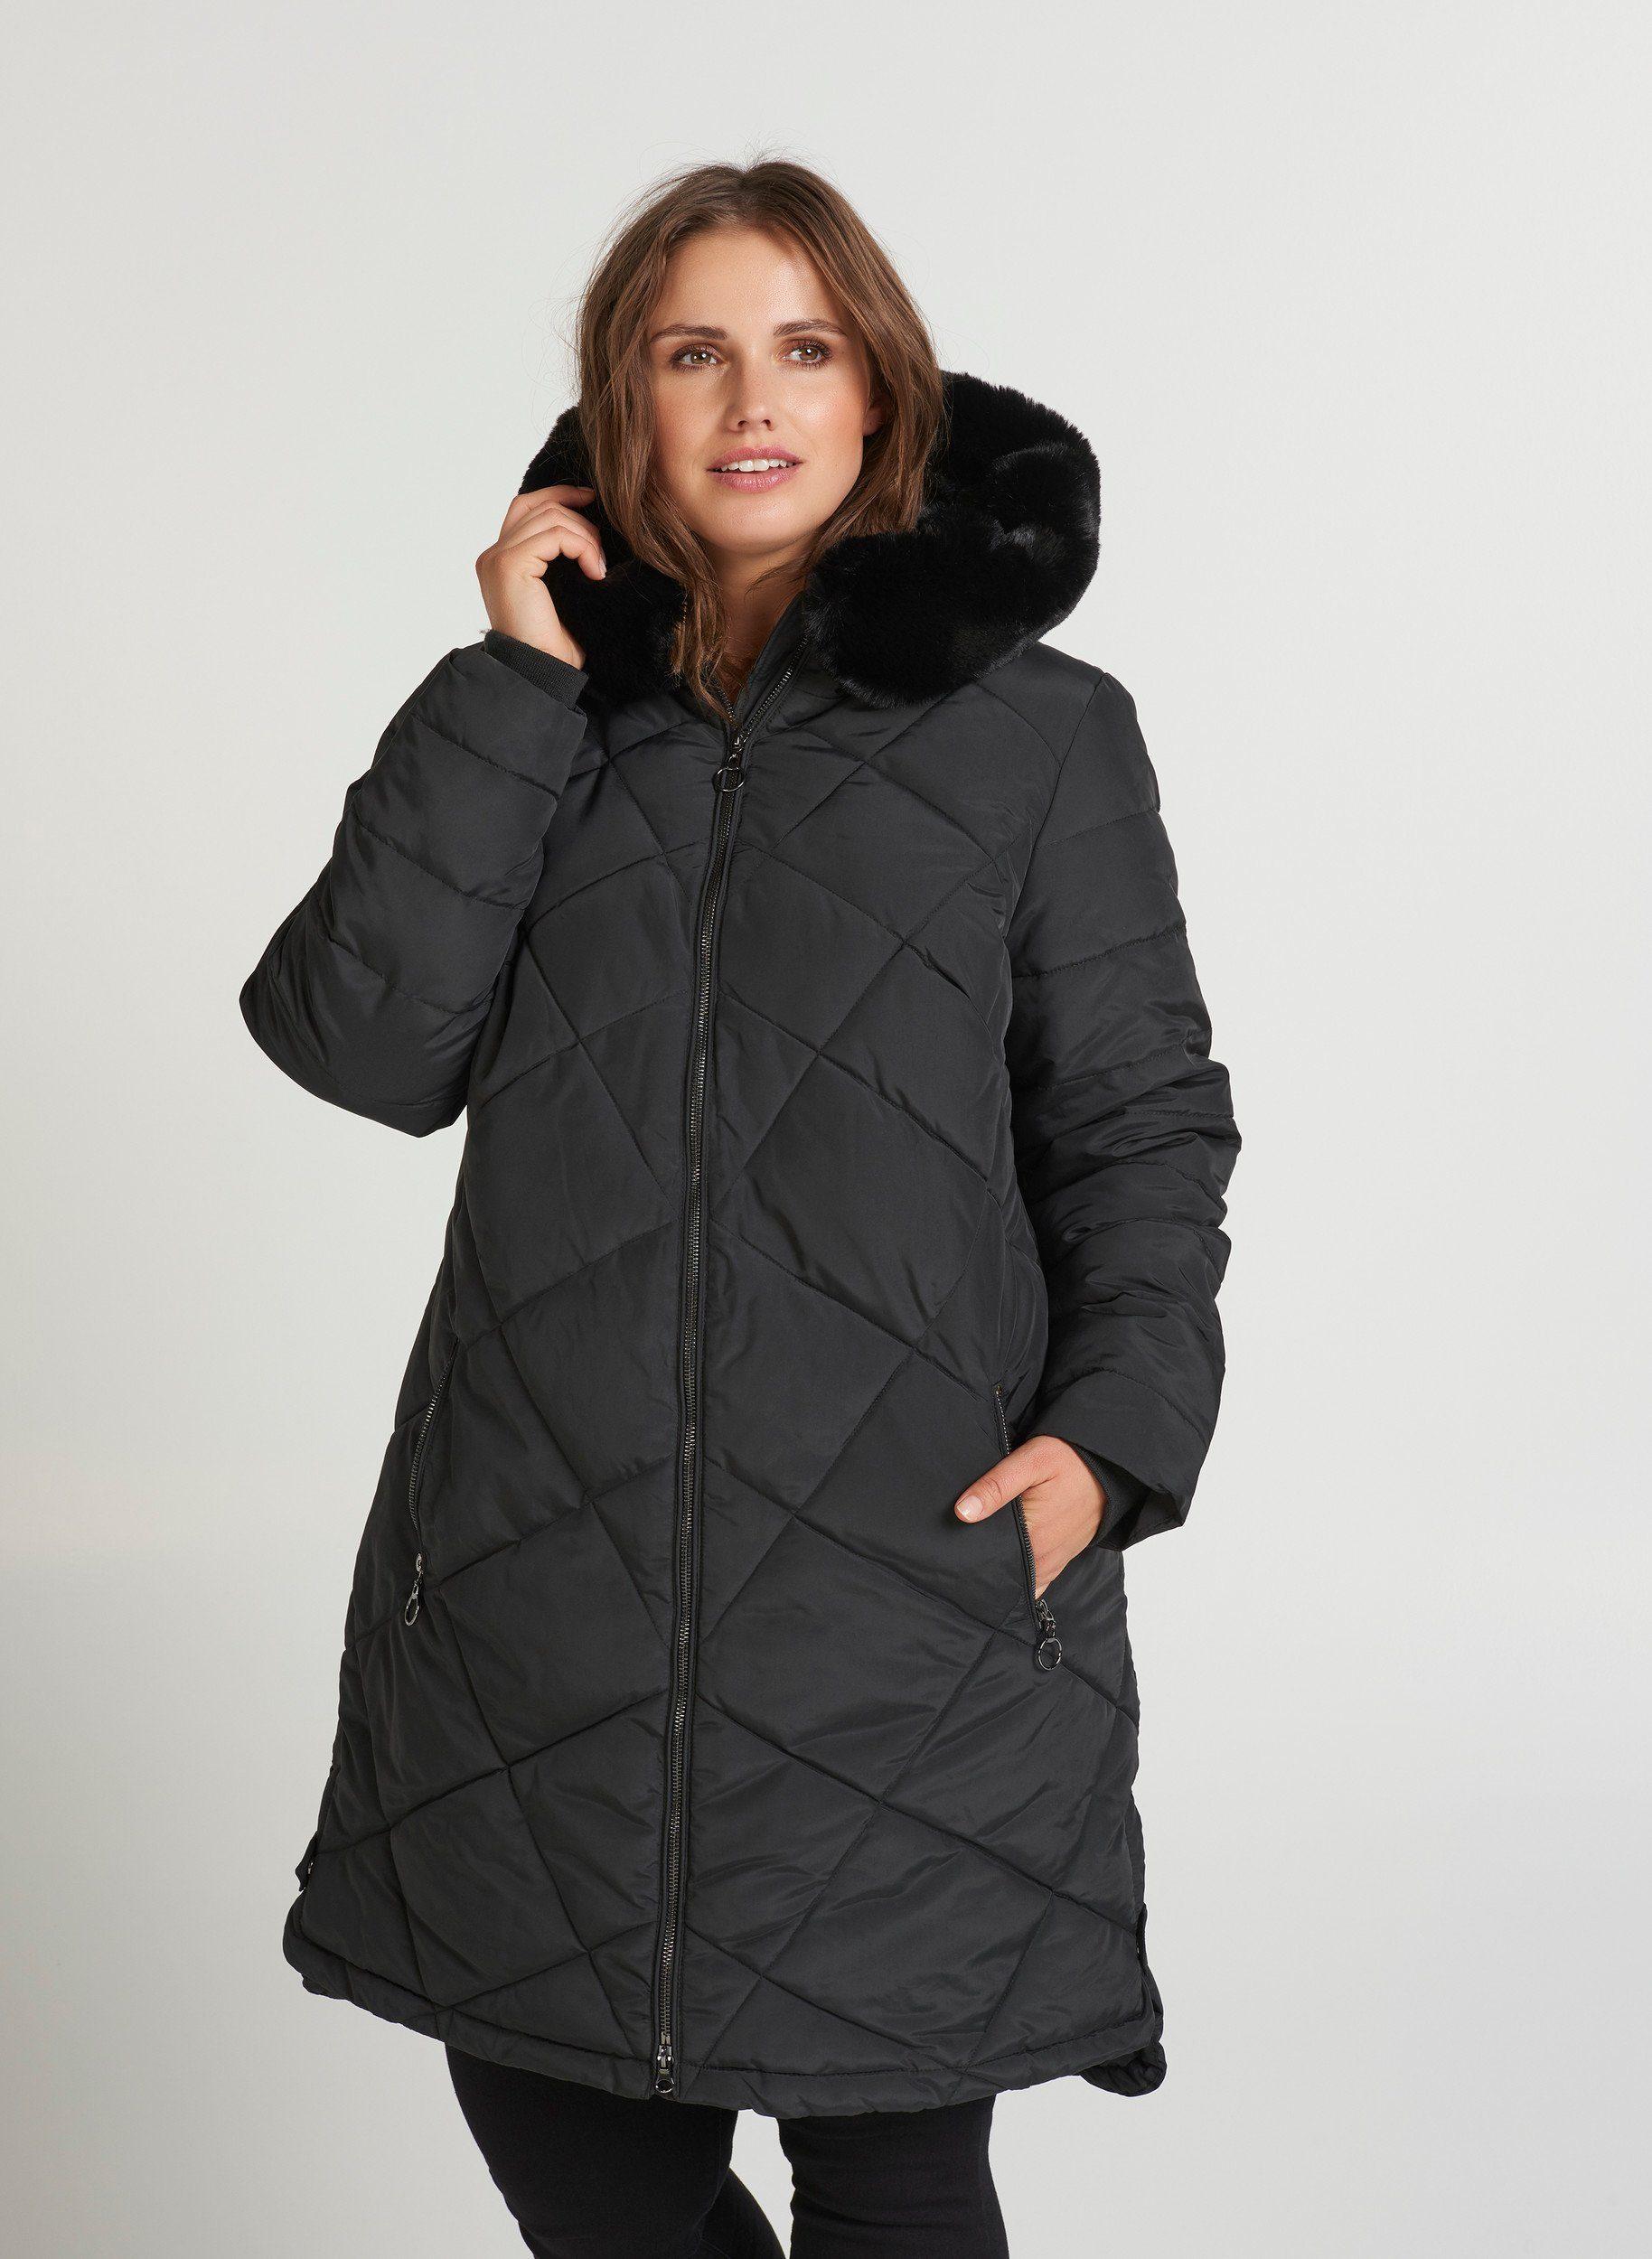 Zizzi Winterjacke Damen Große Größen Wintermantel Parka Kunstfellkapuze Jacke, Schöne Ziersteppungen online kaufen | OTTO